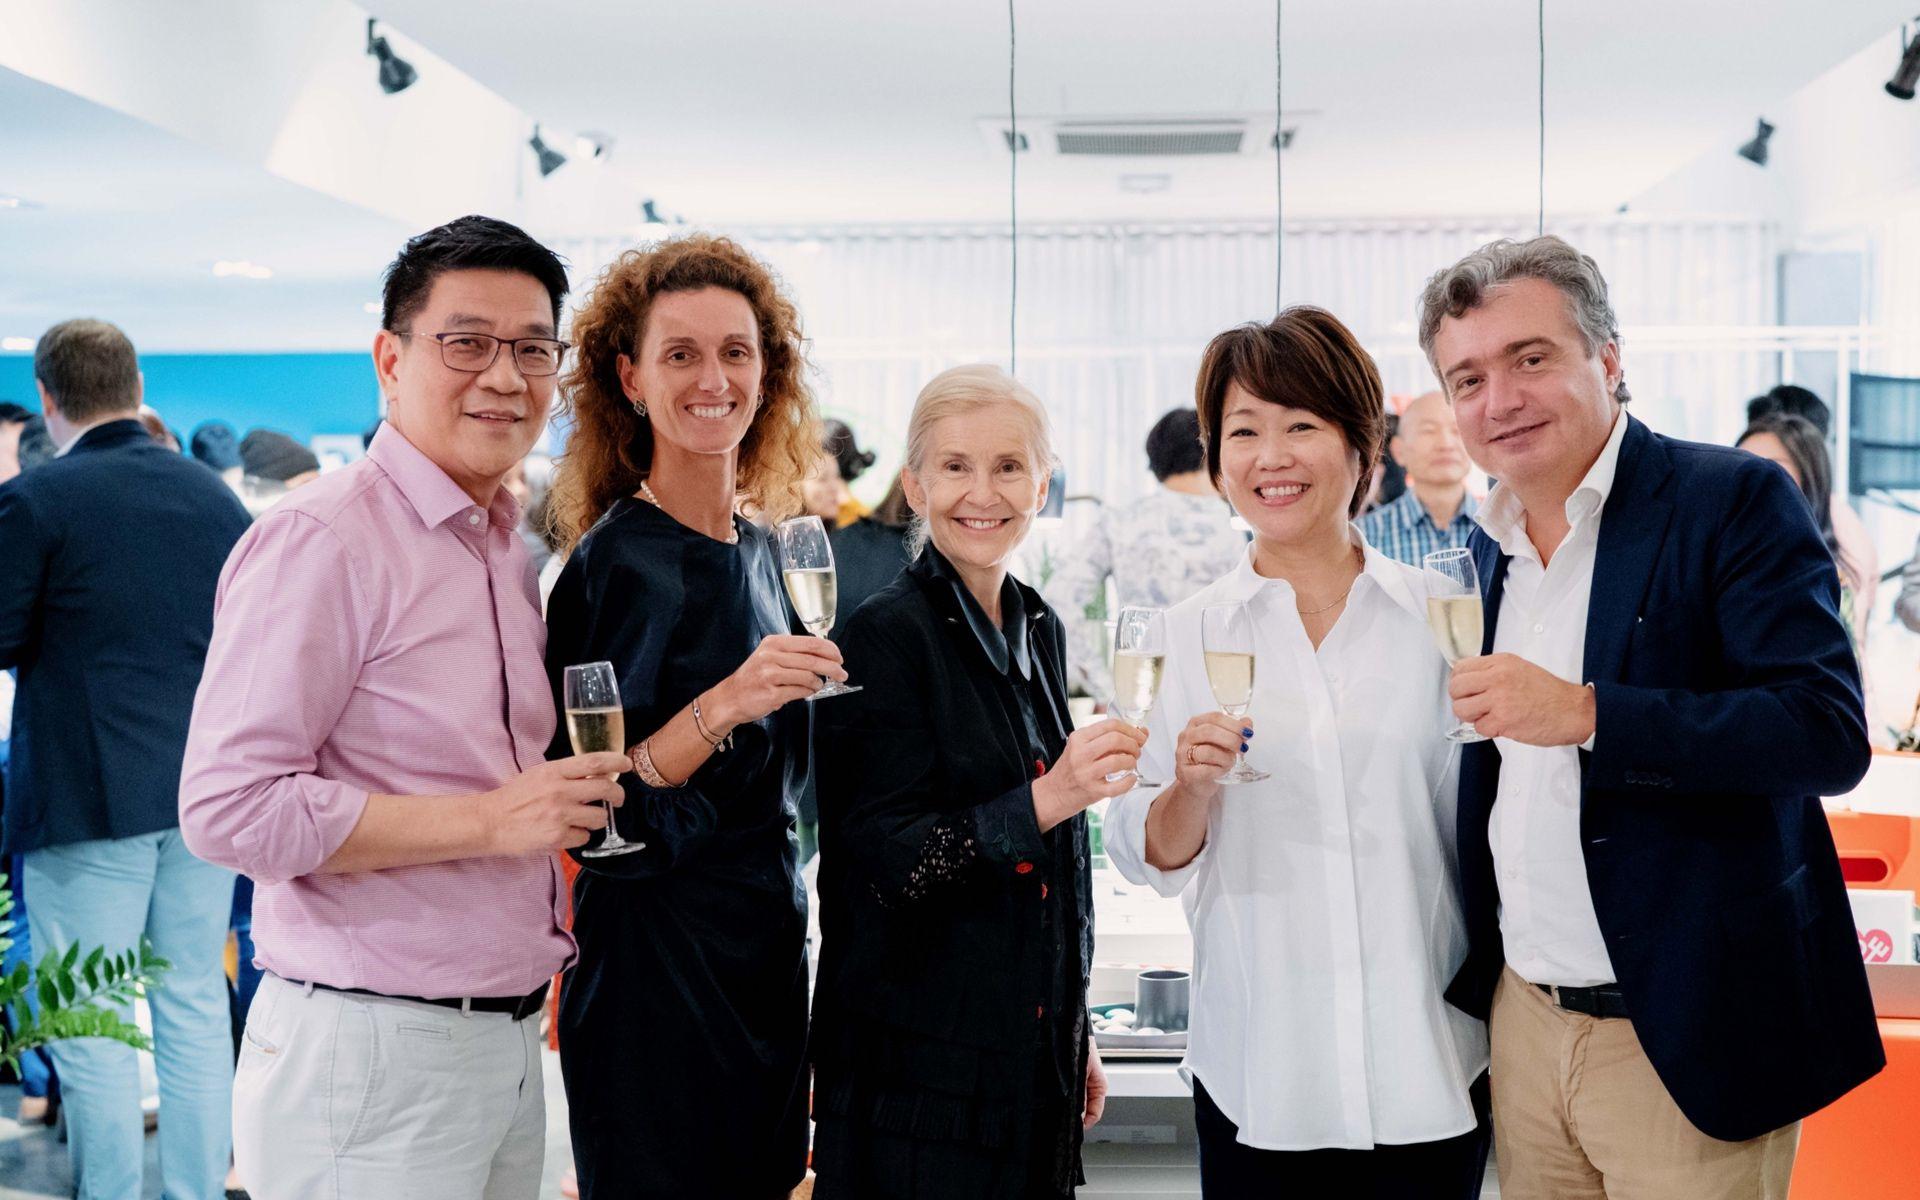 Louis Voon, Martha Ritmonio, HE Andrea Reichlin, Patricia Mok and Andrea Bonardi